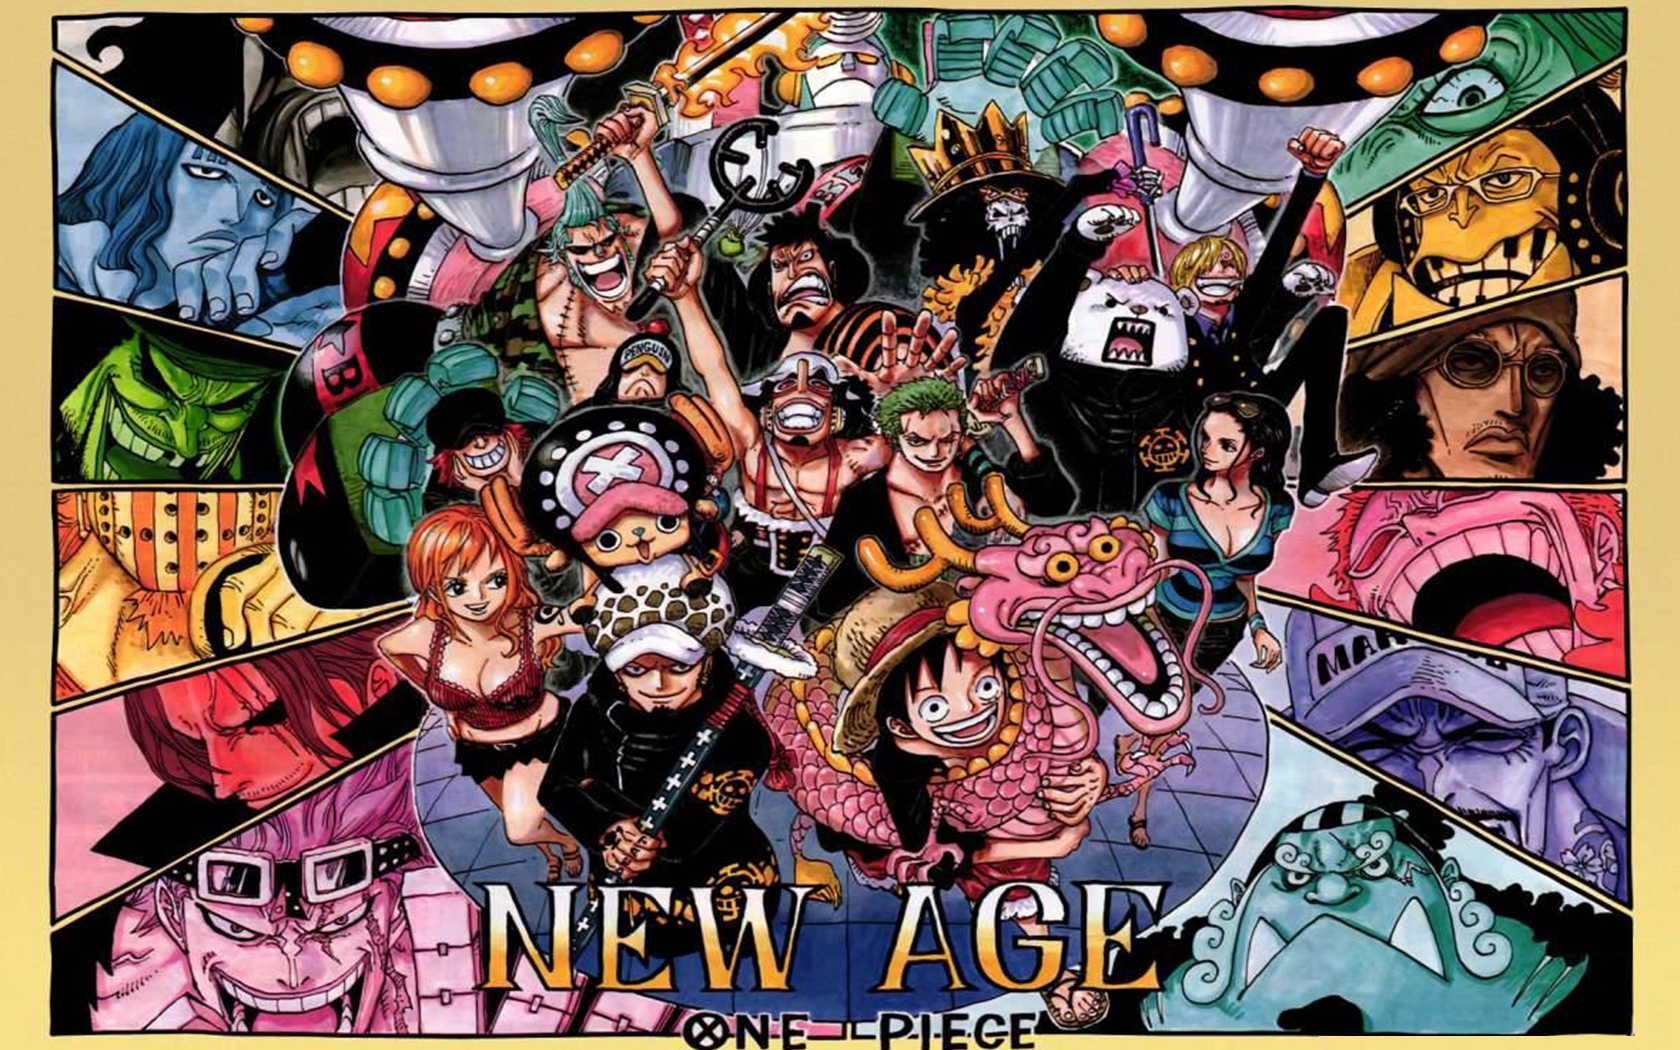 New Age The New Age E Piece E Piece Worst